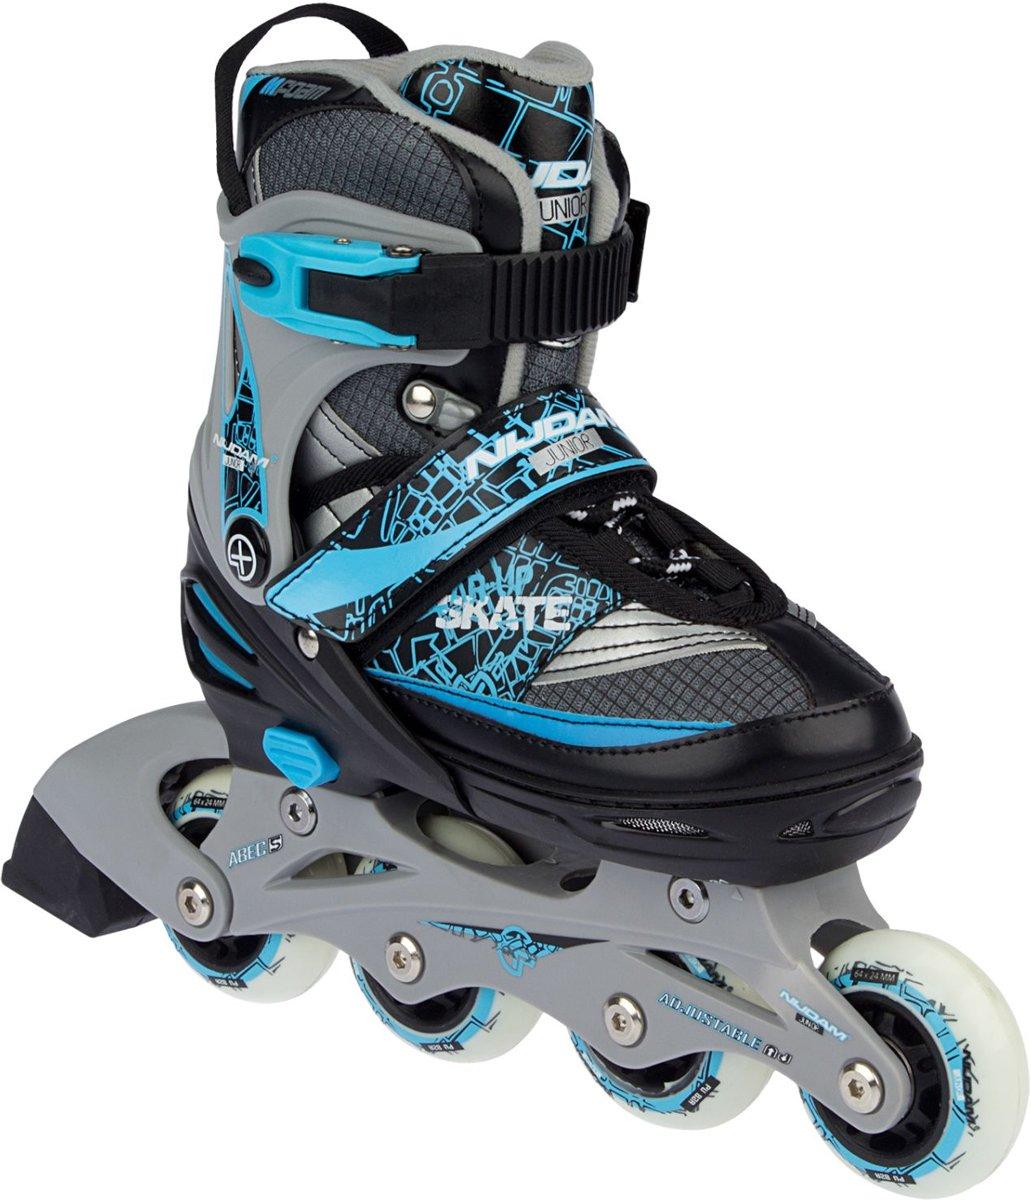 01ee33107fc bol.com | Nijdam Junior Skate/Schaats Combo - Semi-Softboot - Zwart - Maat  31-34